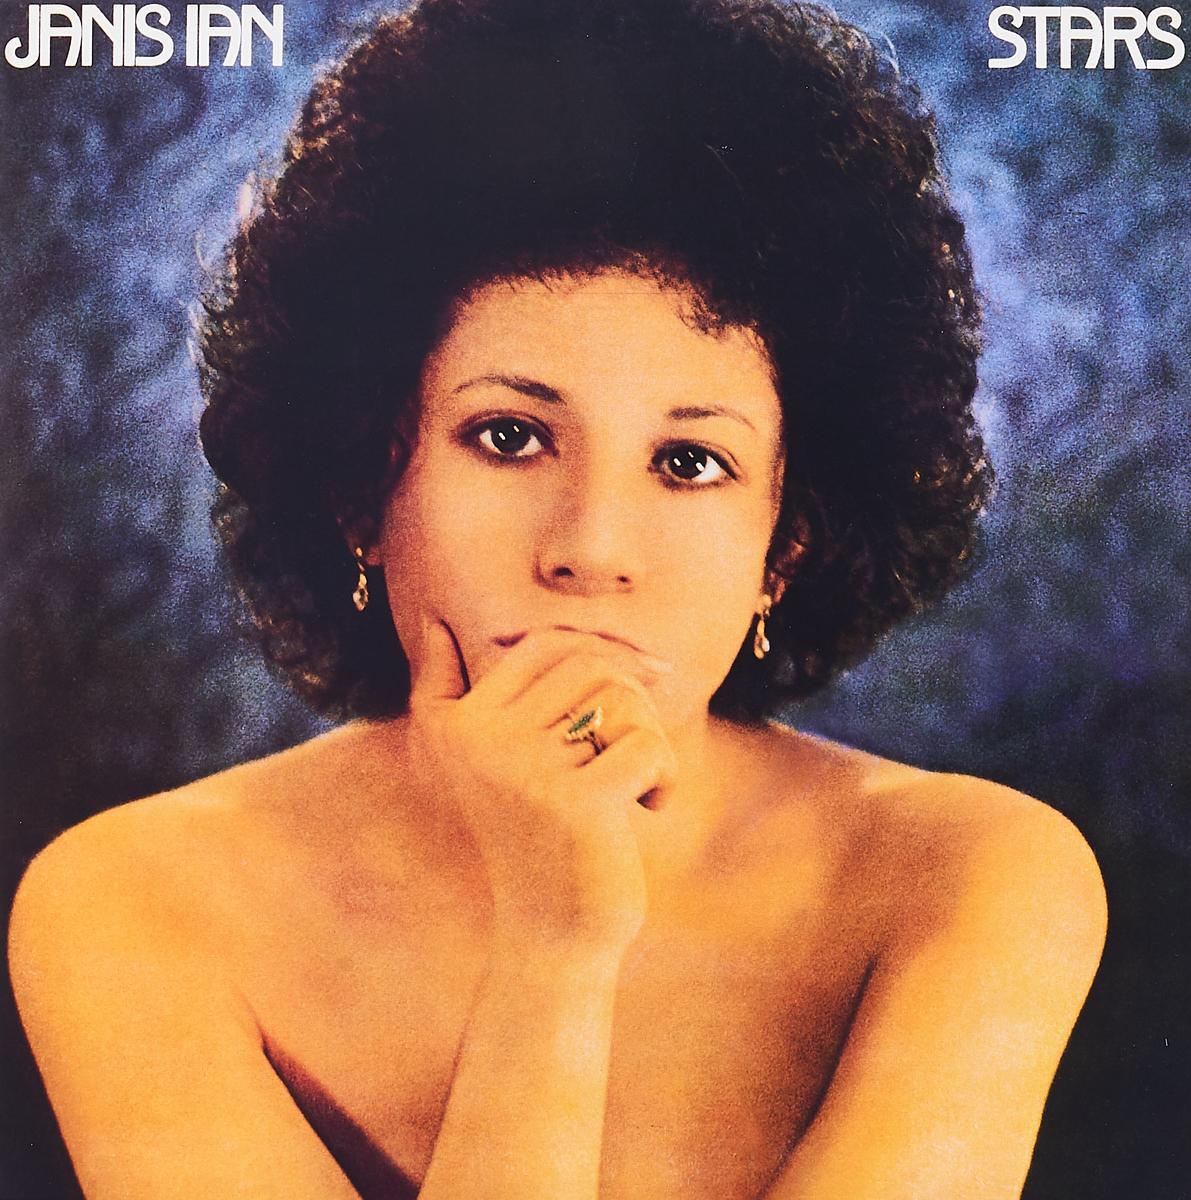 Жанис Ян Janis Ian. Stars (LP) виниловая пластинка janis ian stars